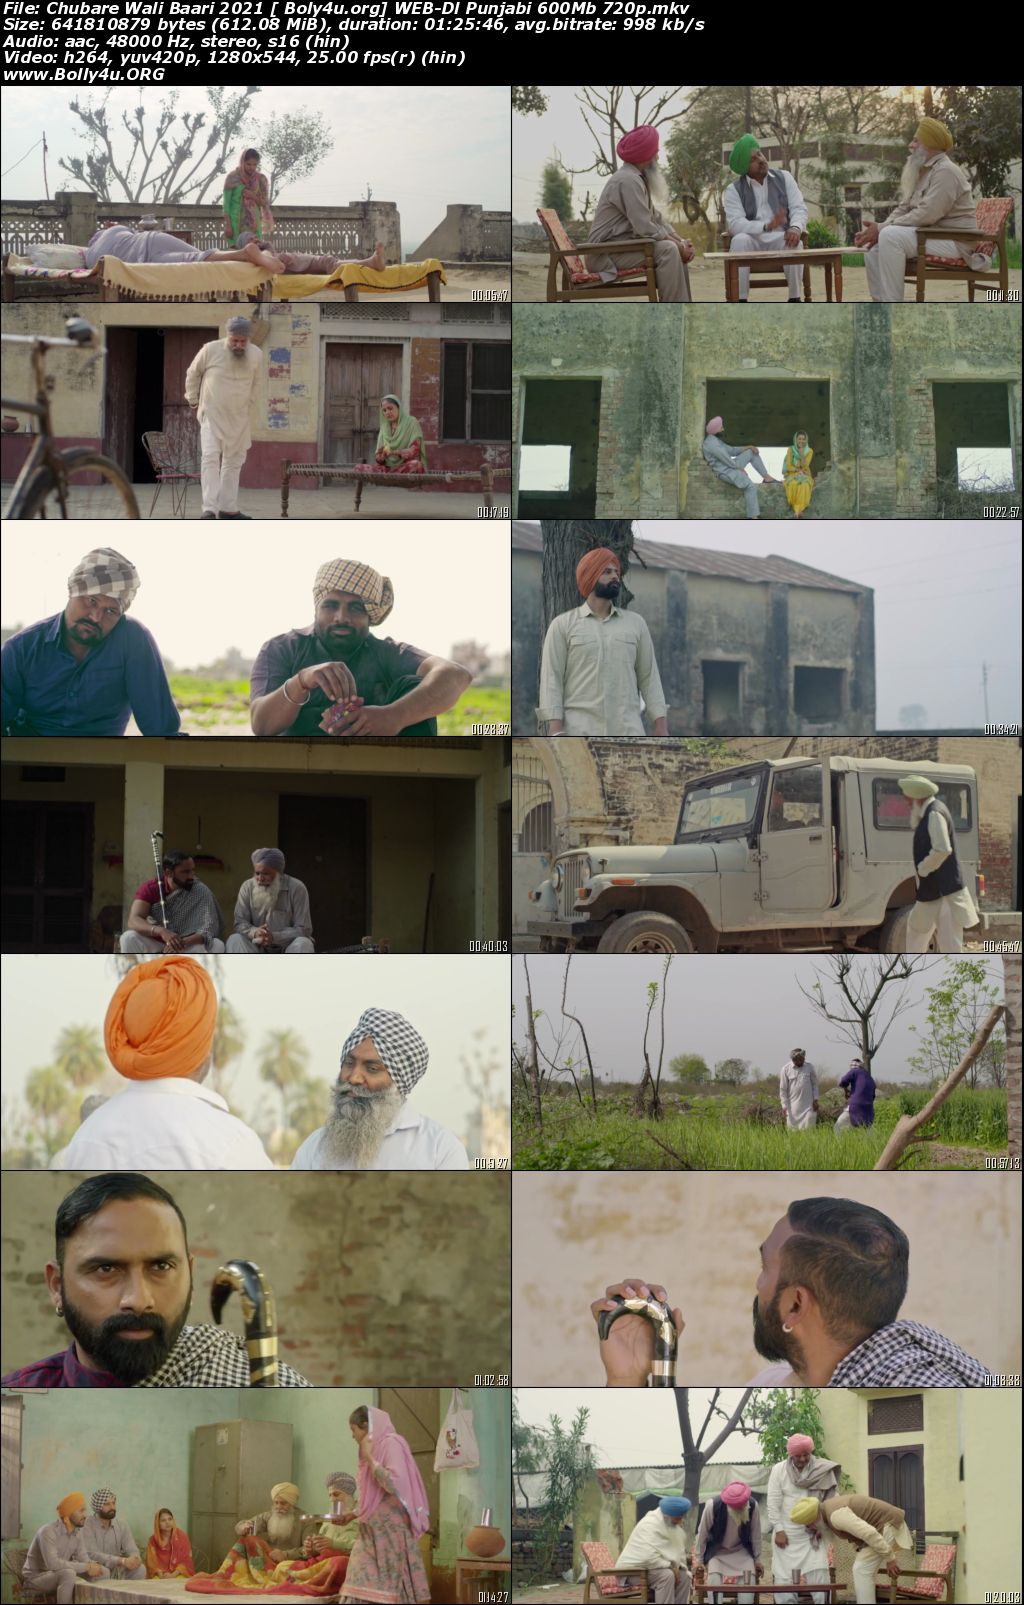 Chubare Wali Baari 2021 WEB-DL 600Mb Hindi 720p Download